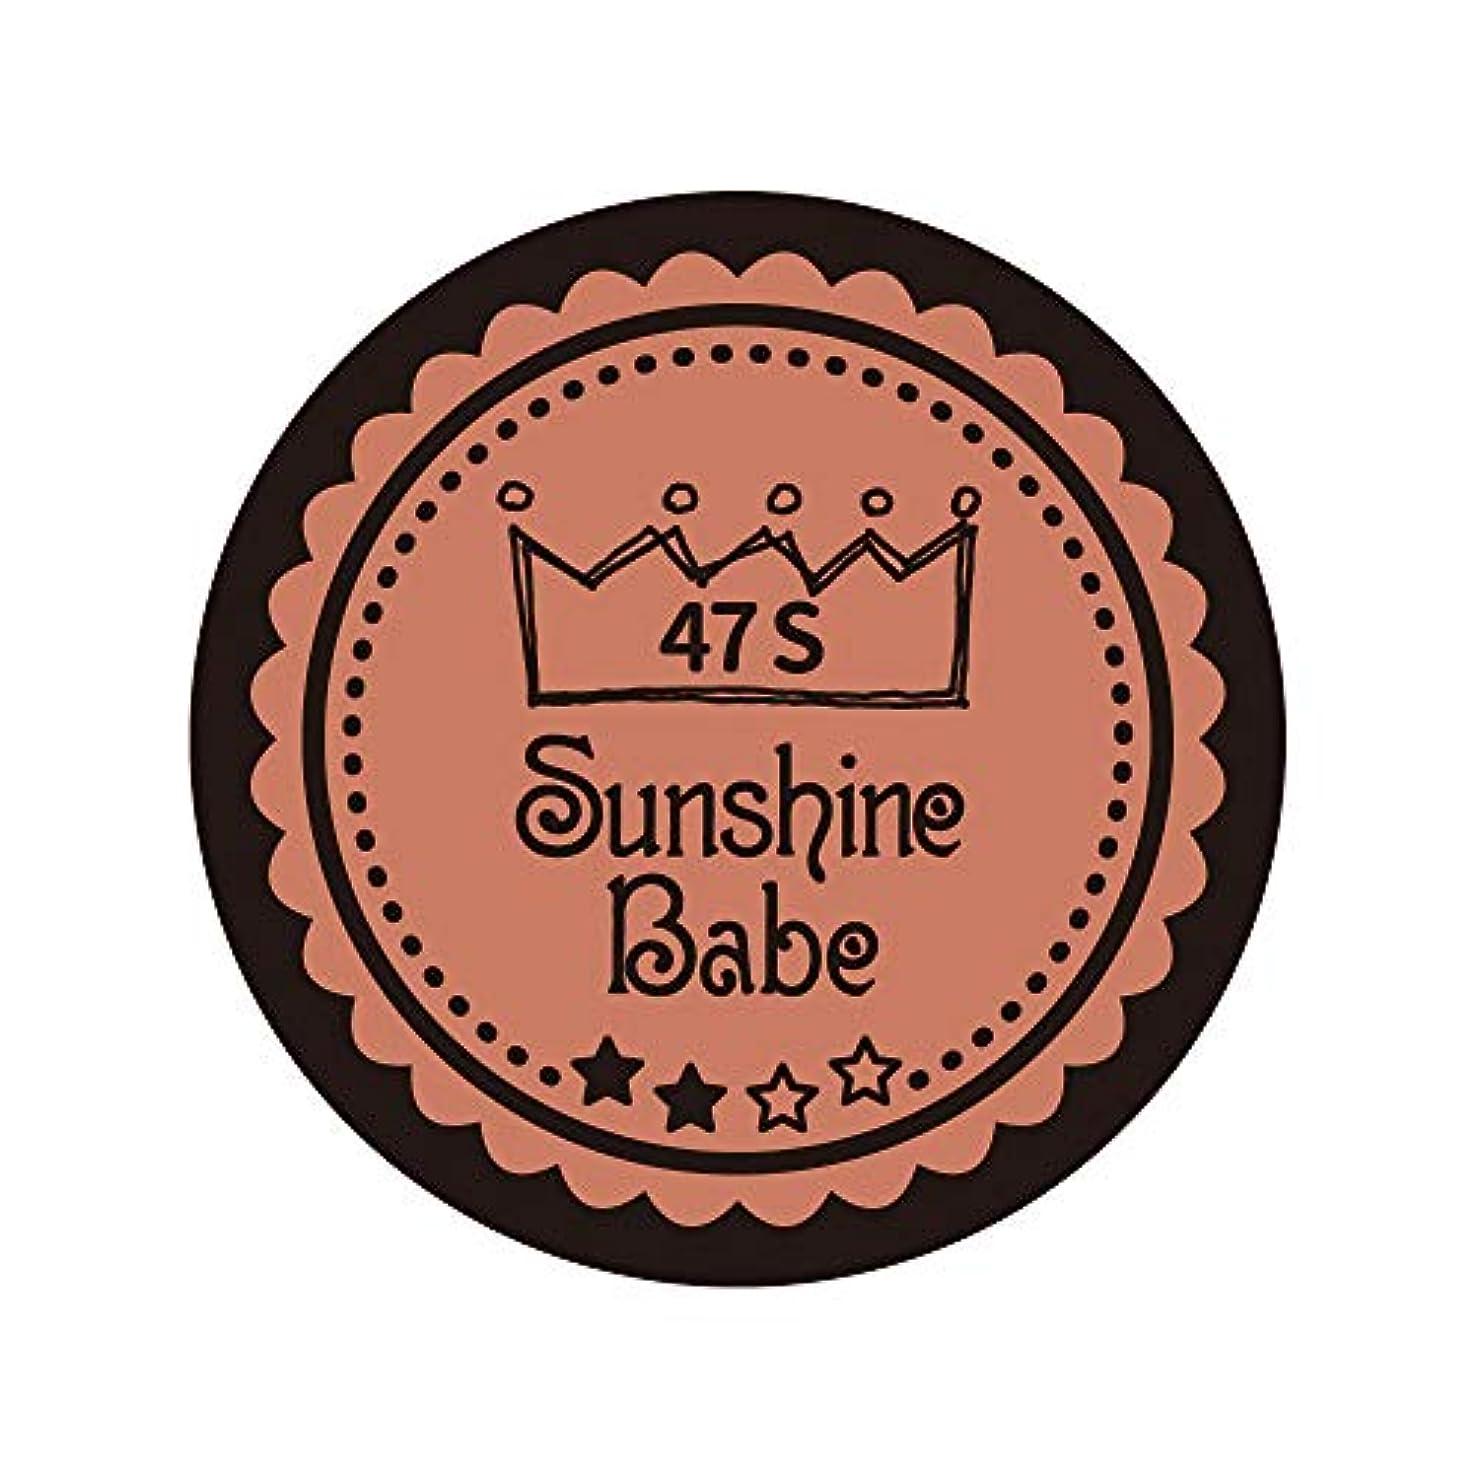 Sunshine Babe カラージェル 47S ピーチブラウン 4g UV/LED対応